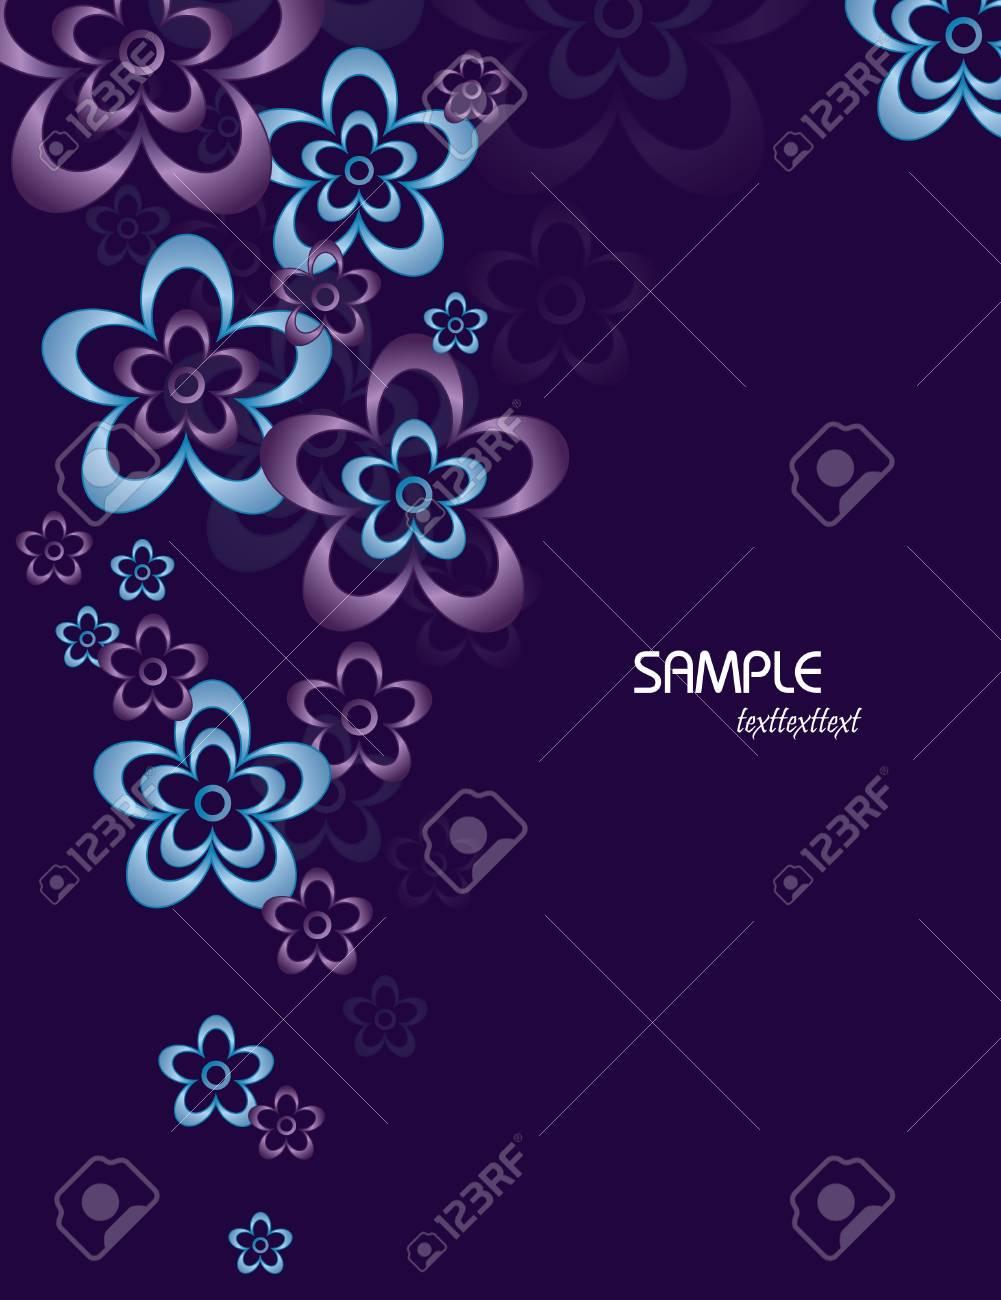 Floral Background  Vector Illustration  Eps10 Stock Vector - 13005133